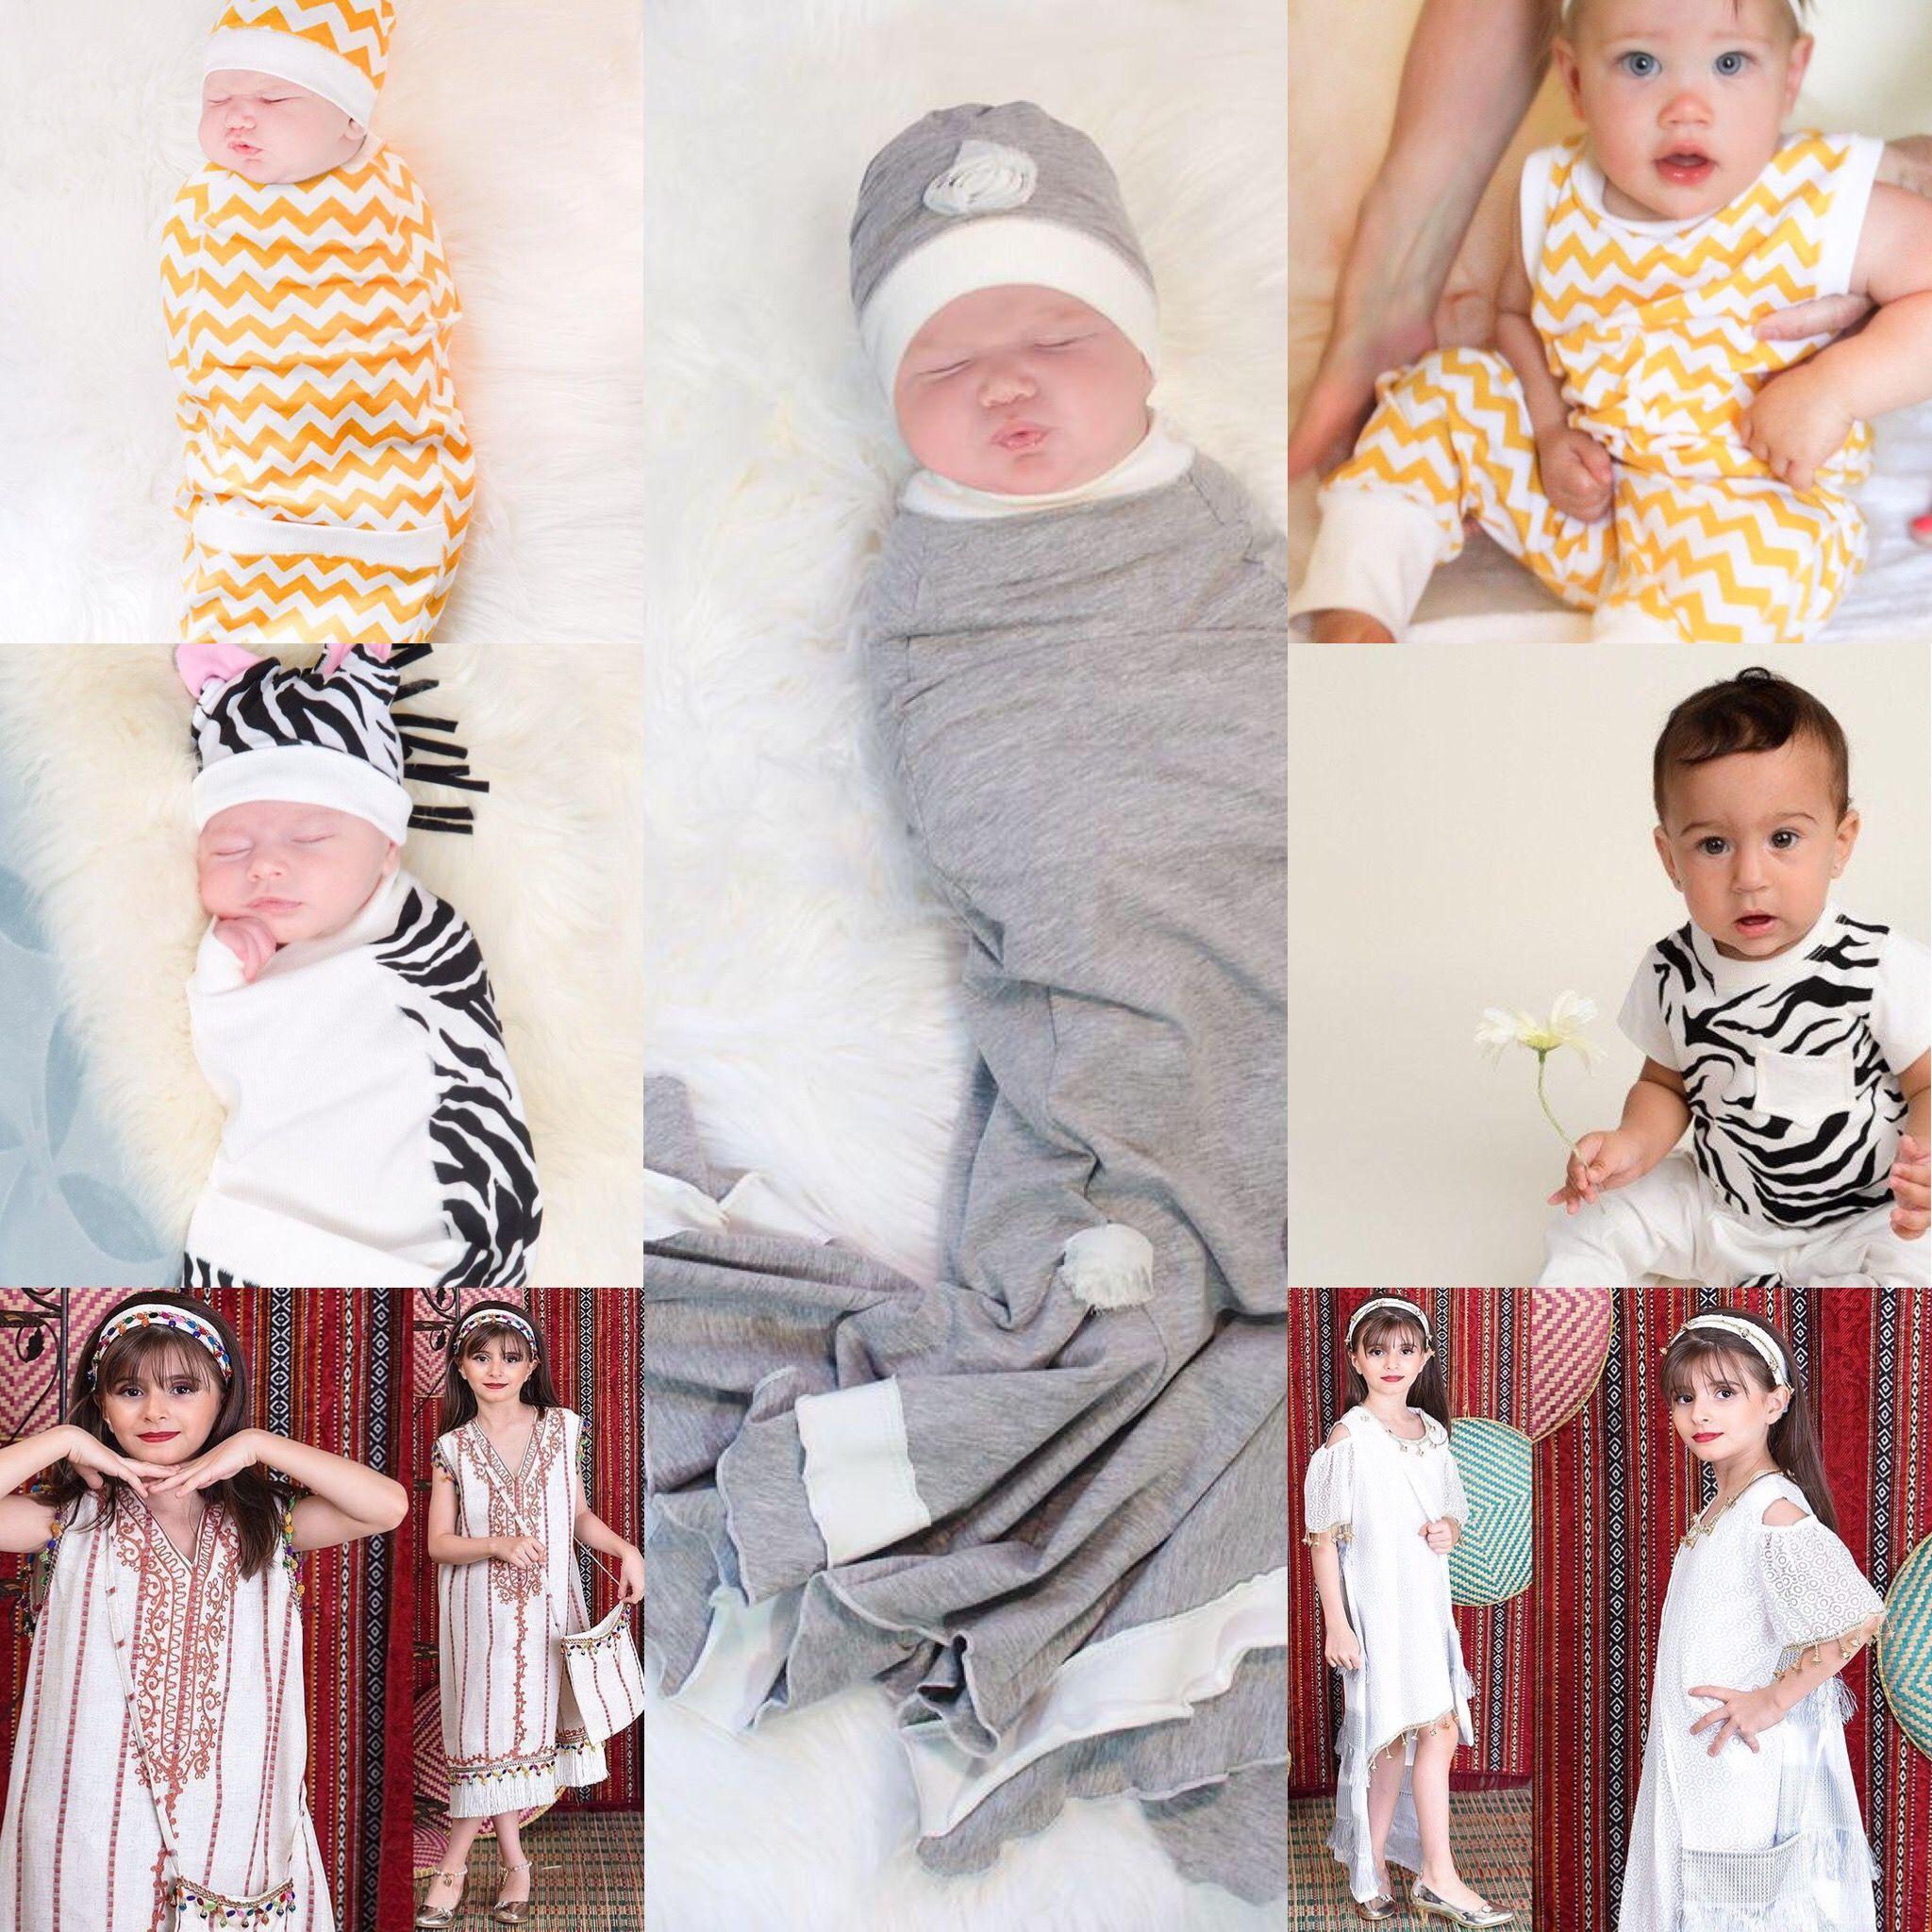 8aac743da معلومات عن الاإعلان : اطقم مواليد قماطات امريكية قطنية ملابس اطفال فساتين  بنات @baby_style8899 واتس